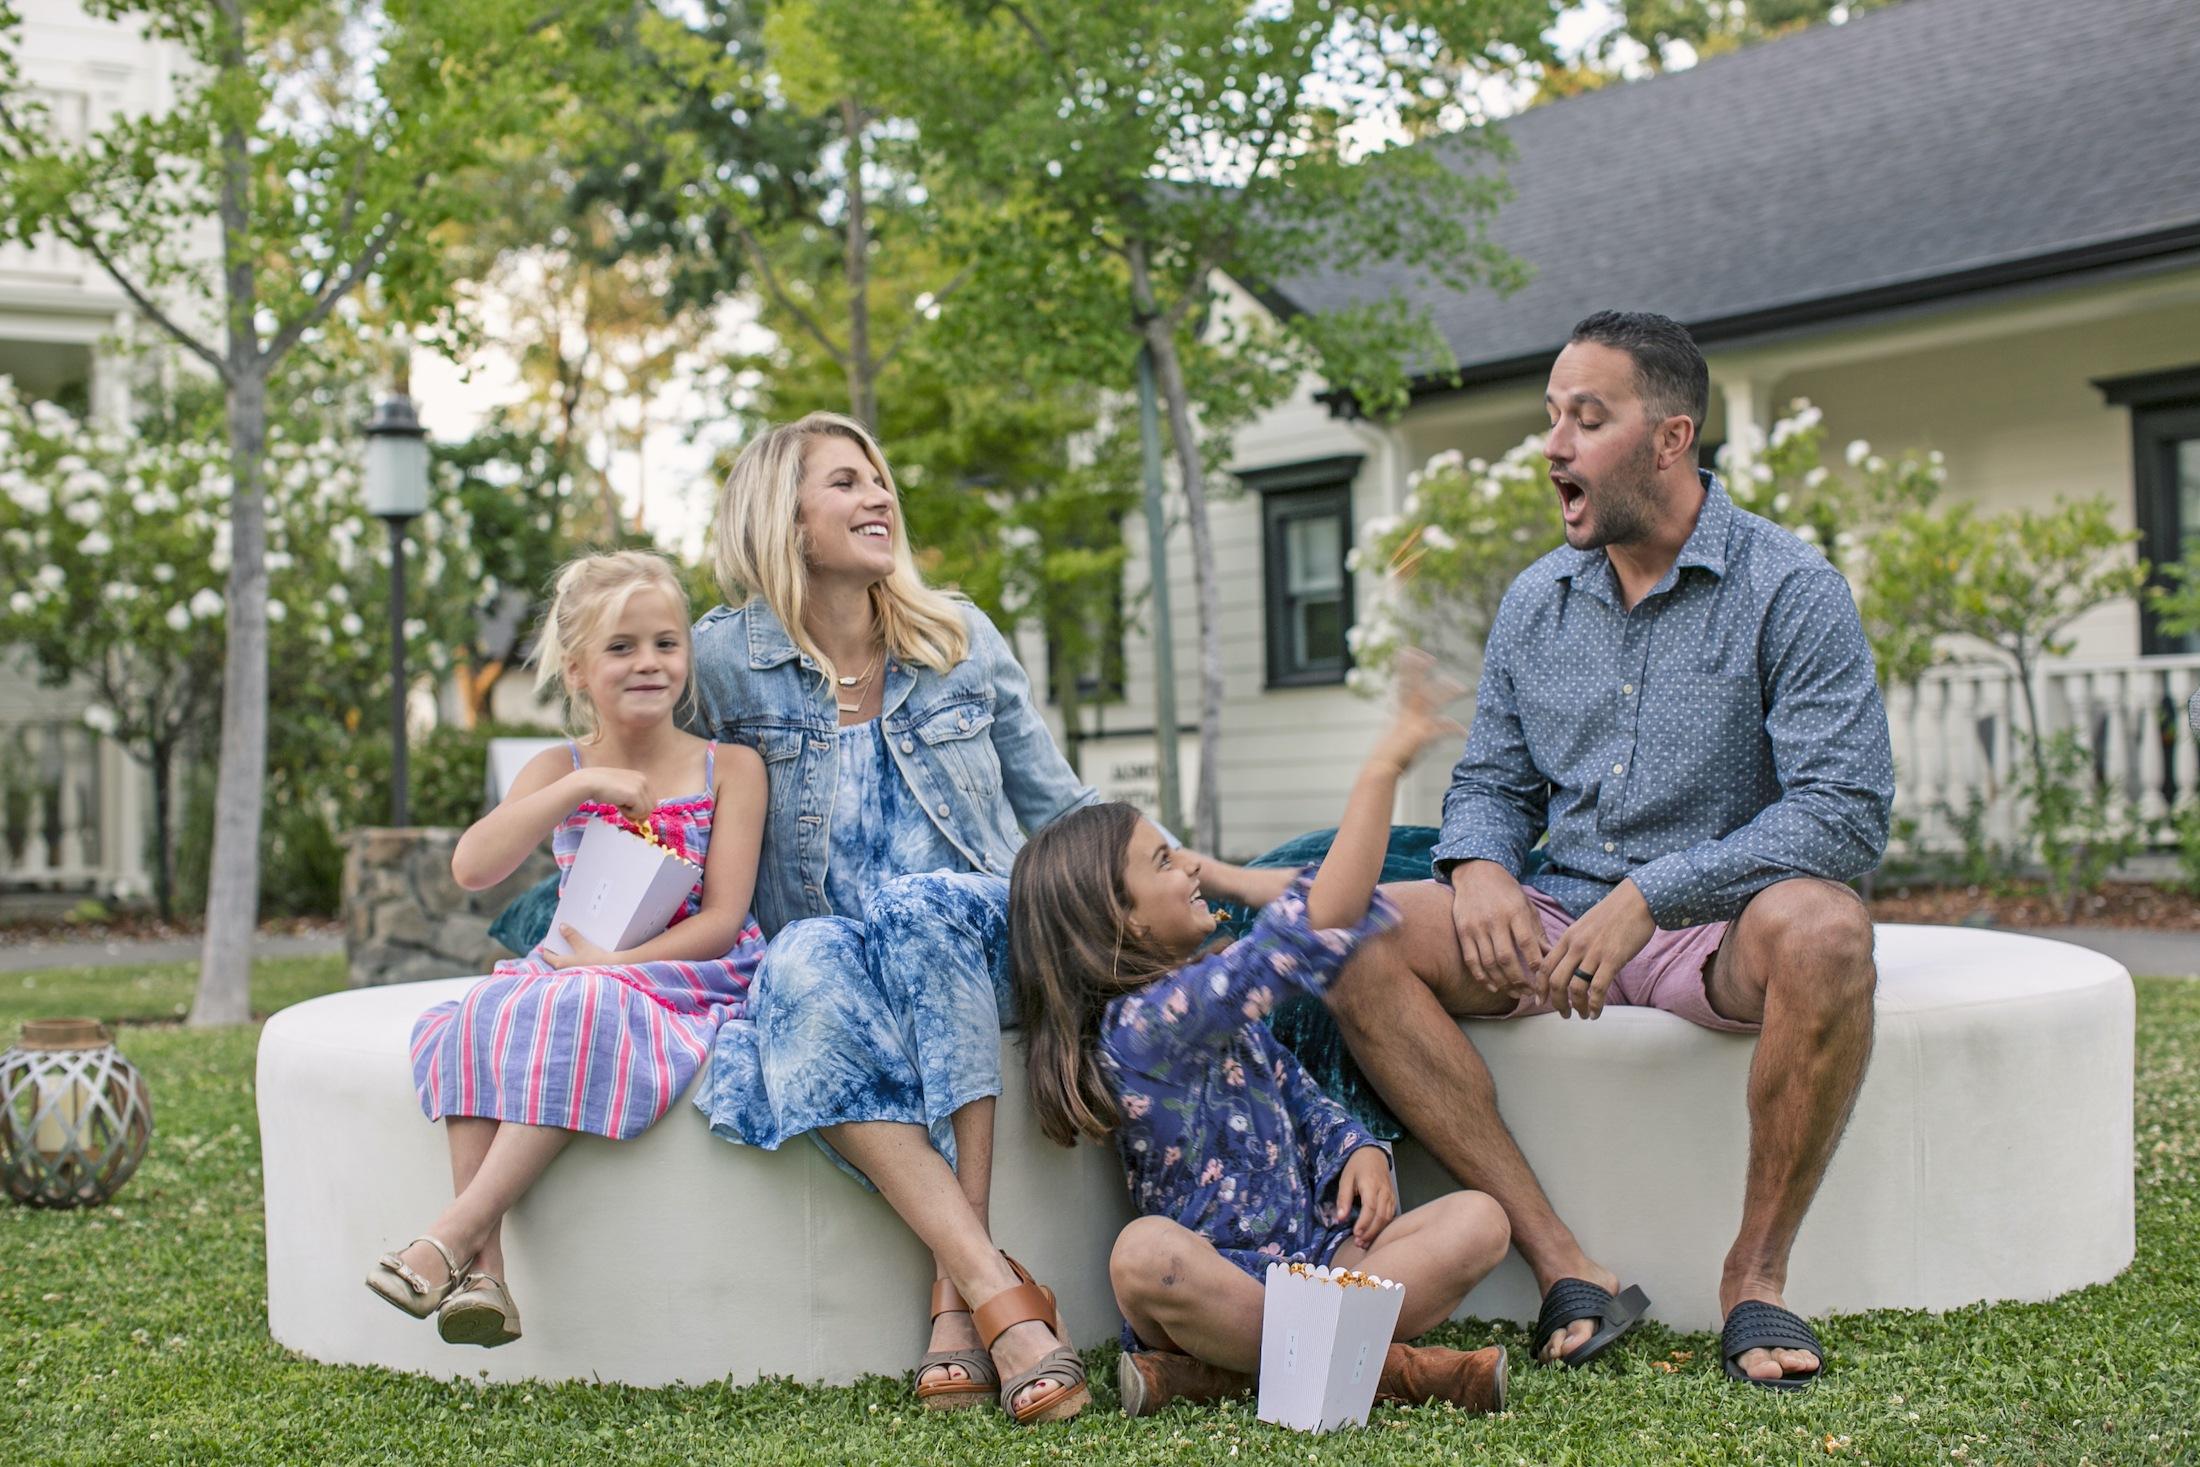 Family-friendly West Lawn